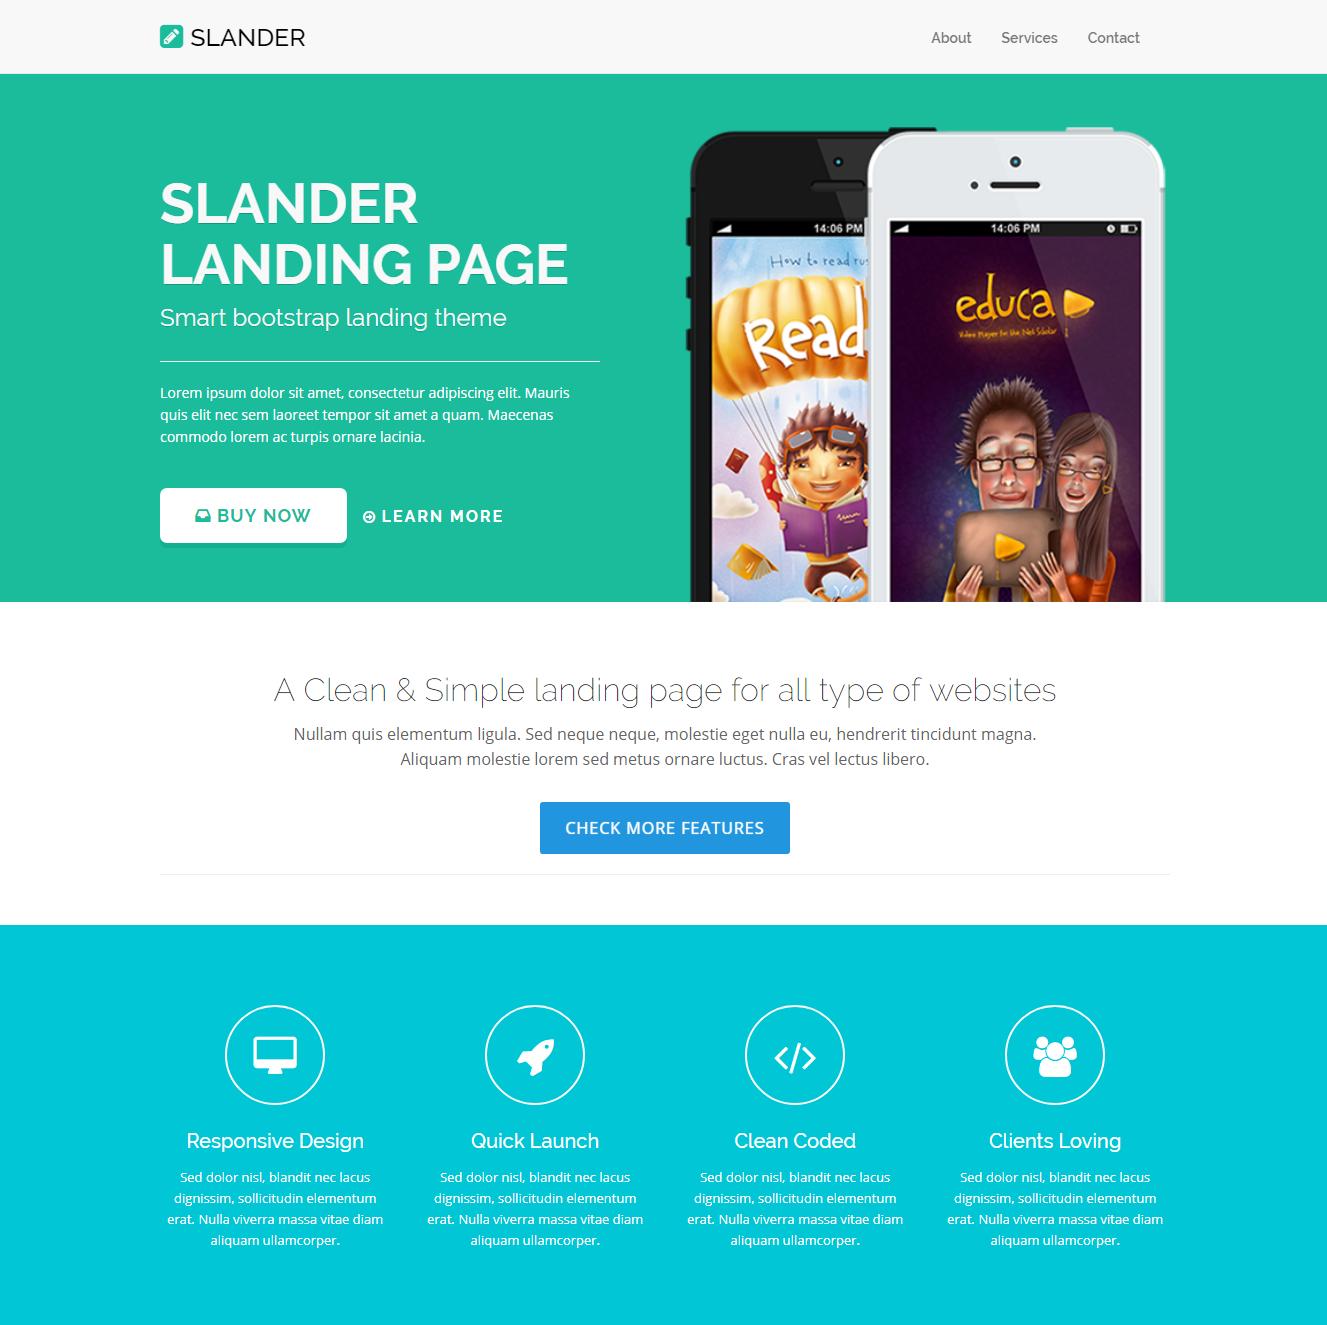 CSS3 Bootstrap Slander Themes